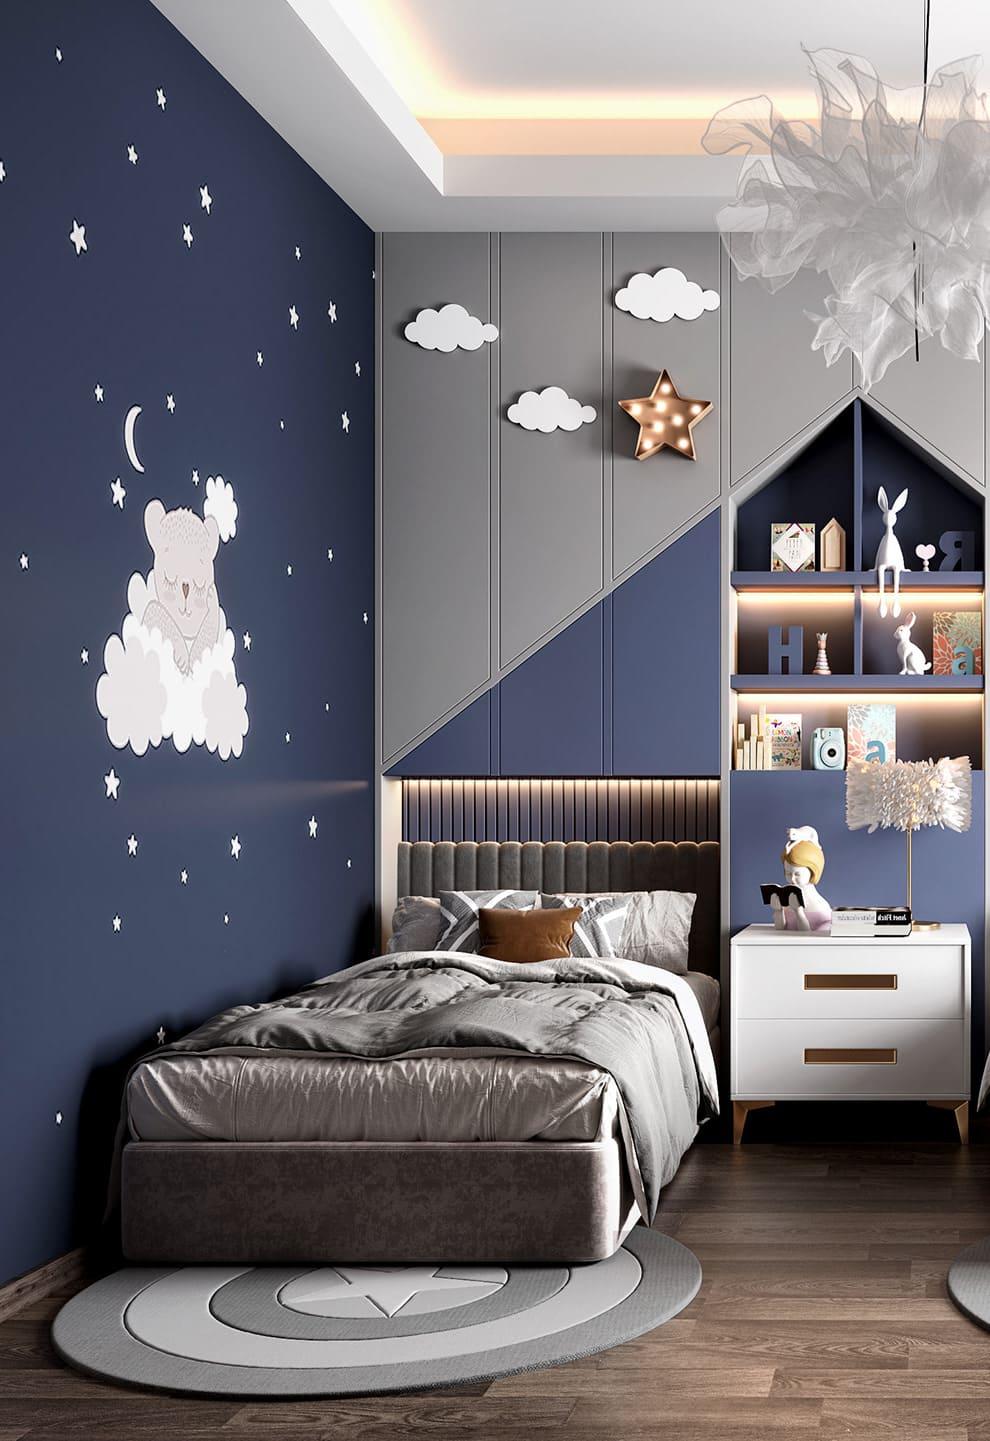 интерьер детской комнаты фото 16